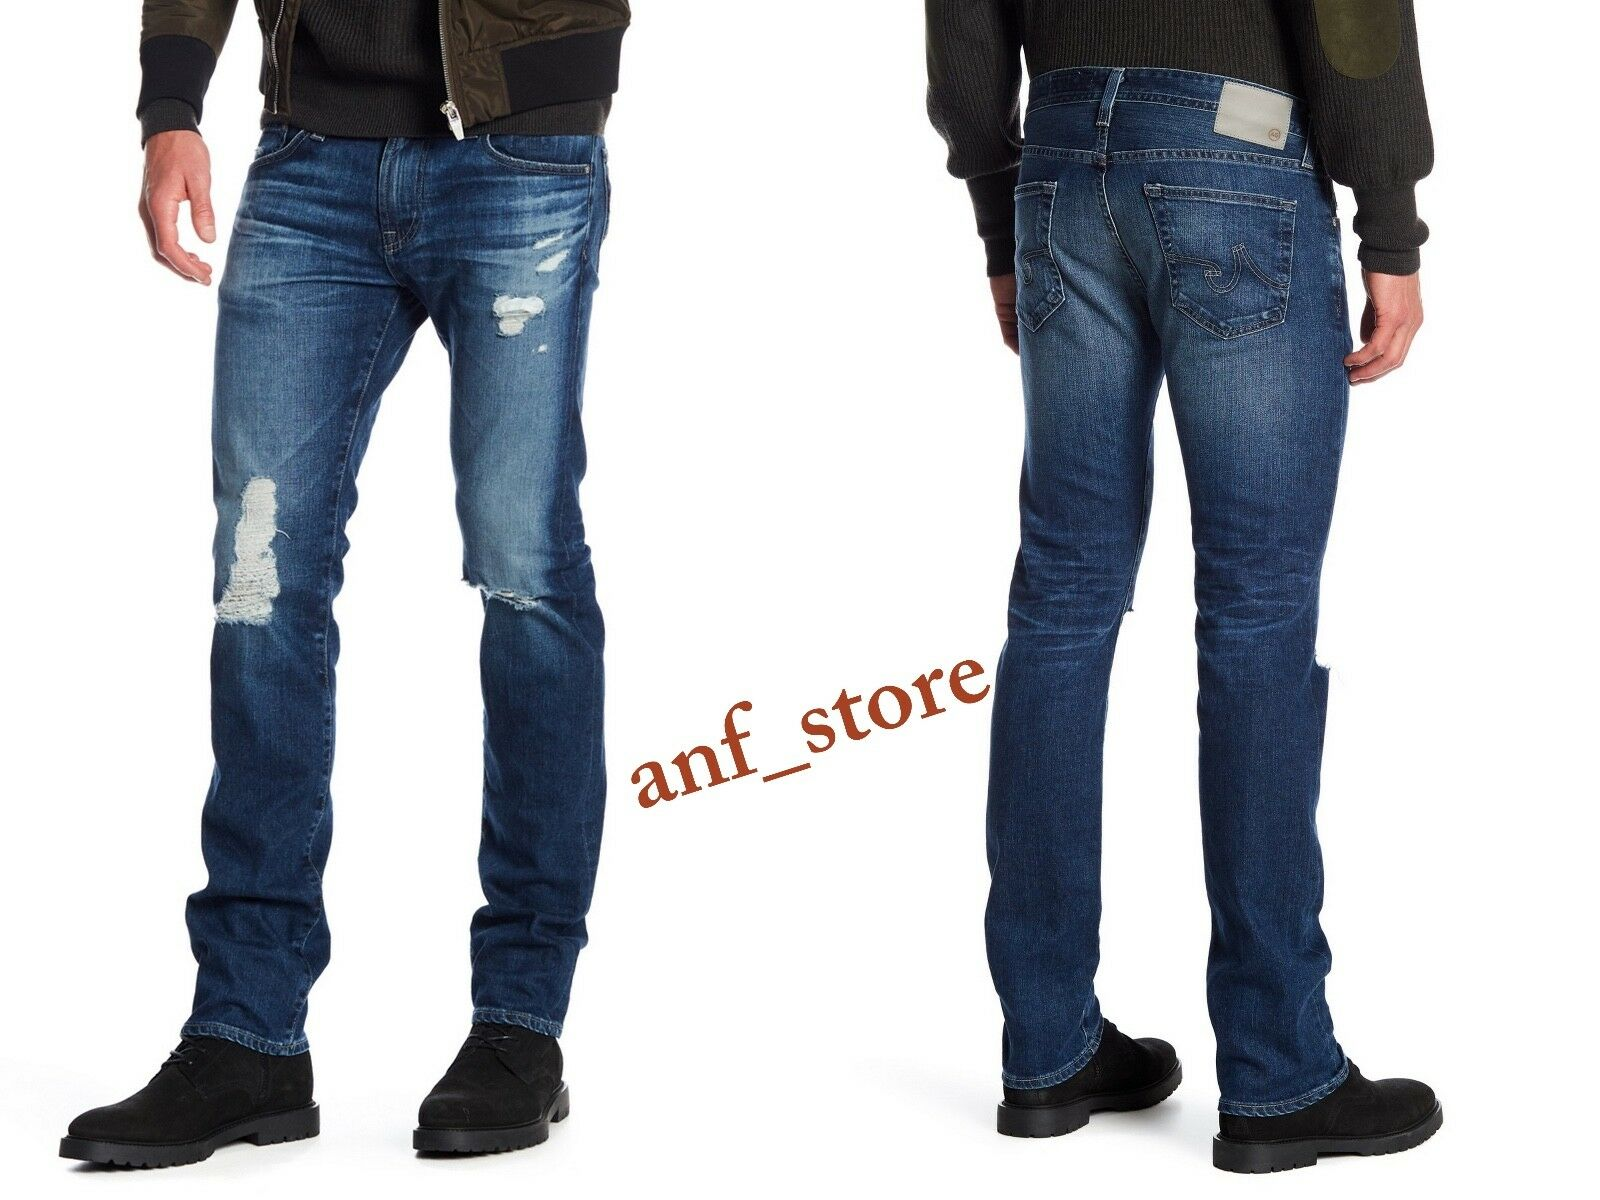 NWT AG Adriano goldschmied MATCHBOX Slim Straight Stretch Mens Jeans 33x32